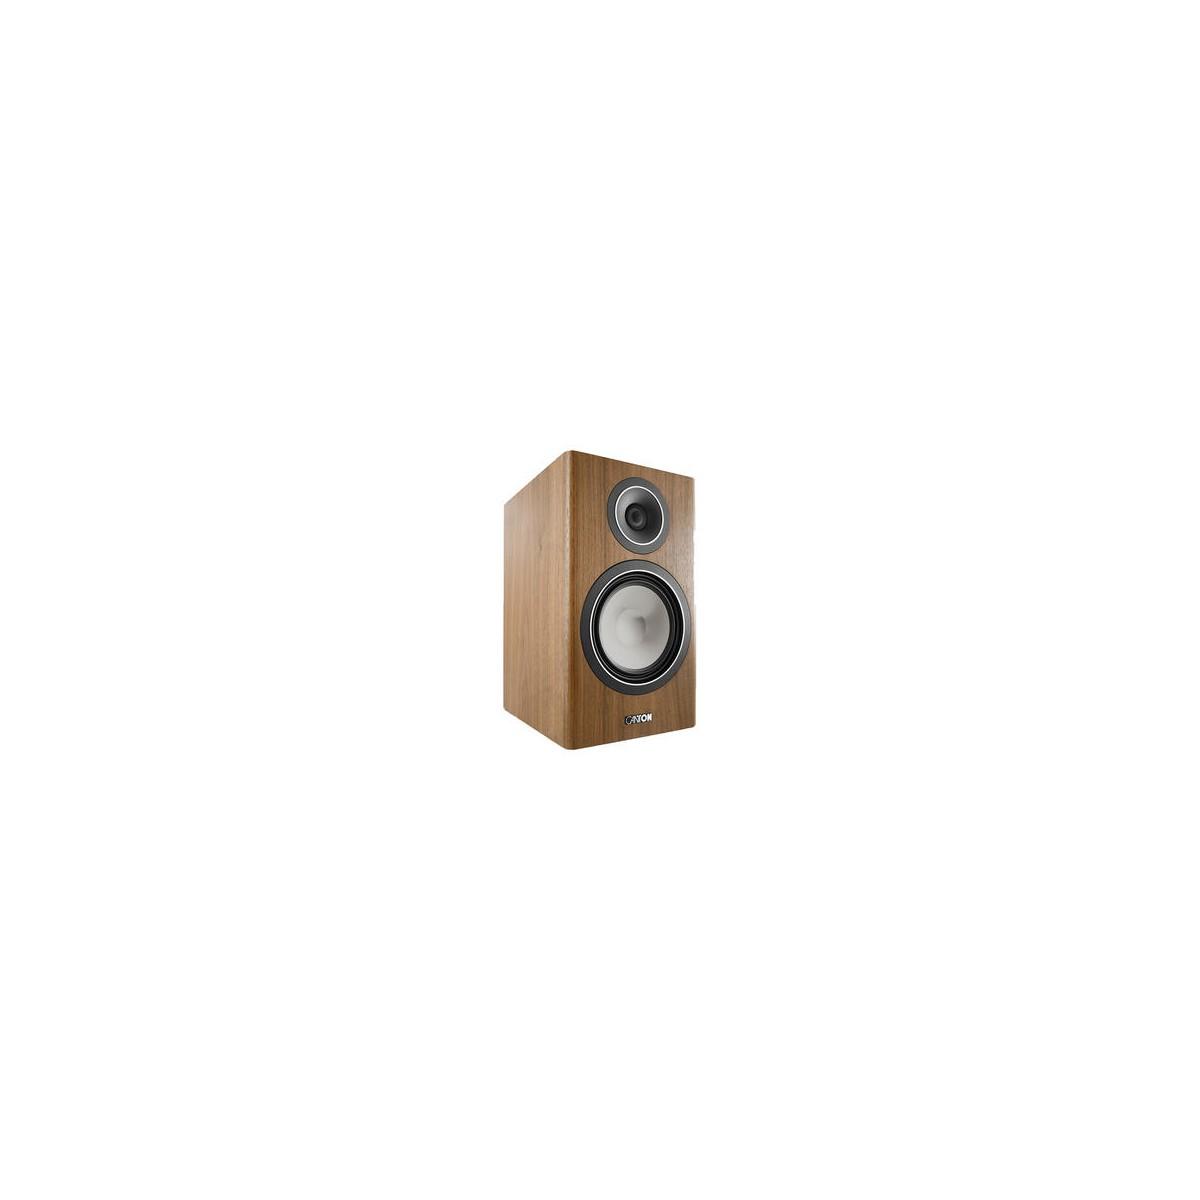 Kompakt-/Regallautsprecher TOWNUS 30 Wood (Paarpreis)